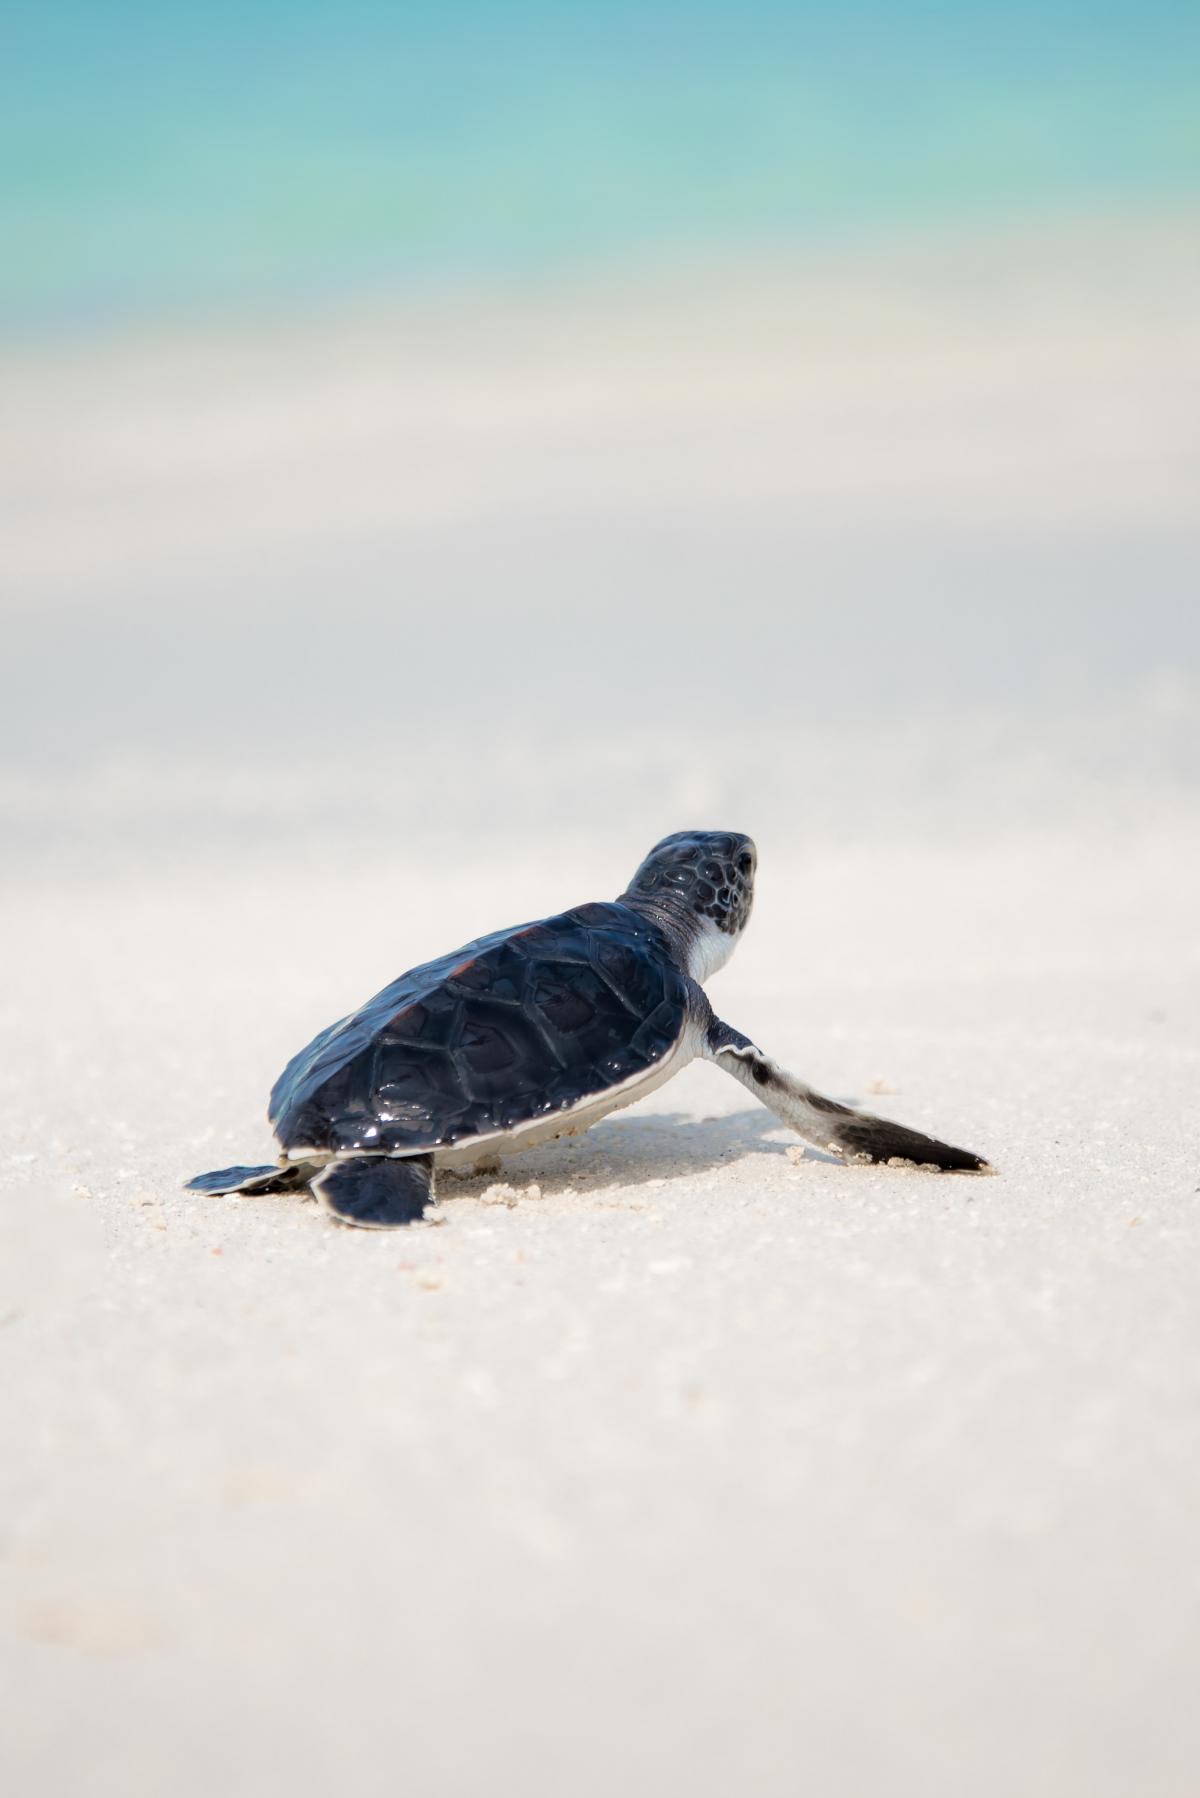 Sea turtle Turtle Reptile